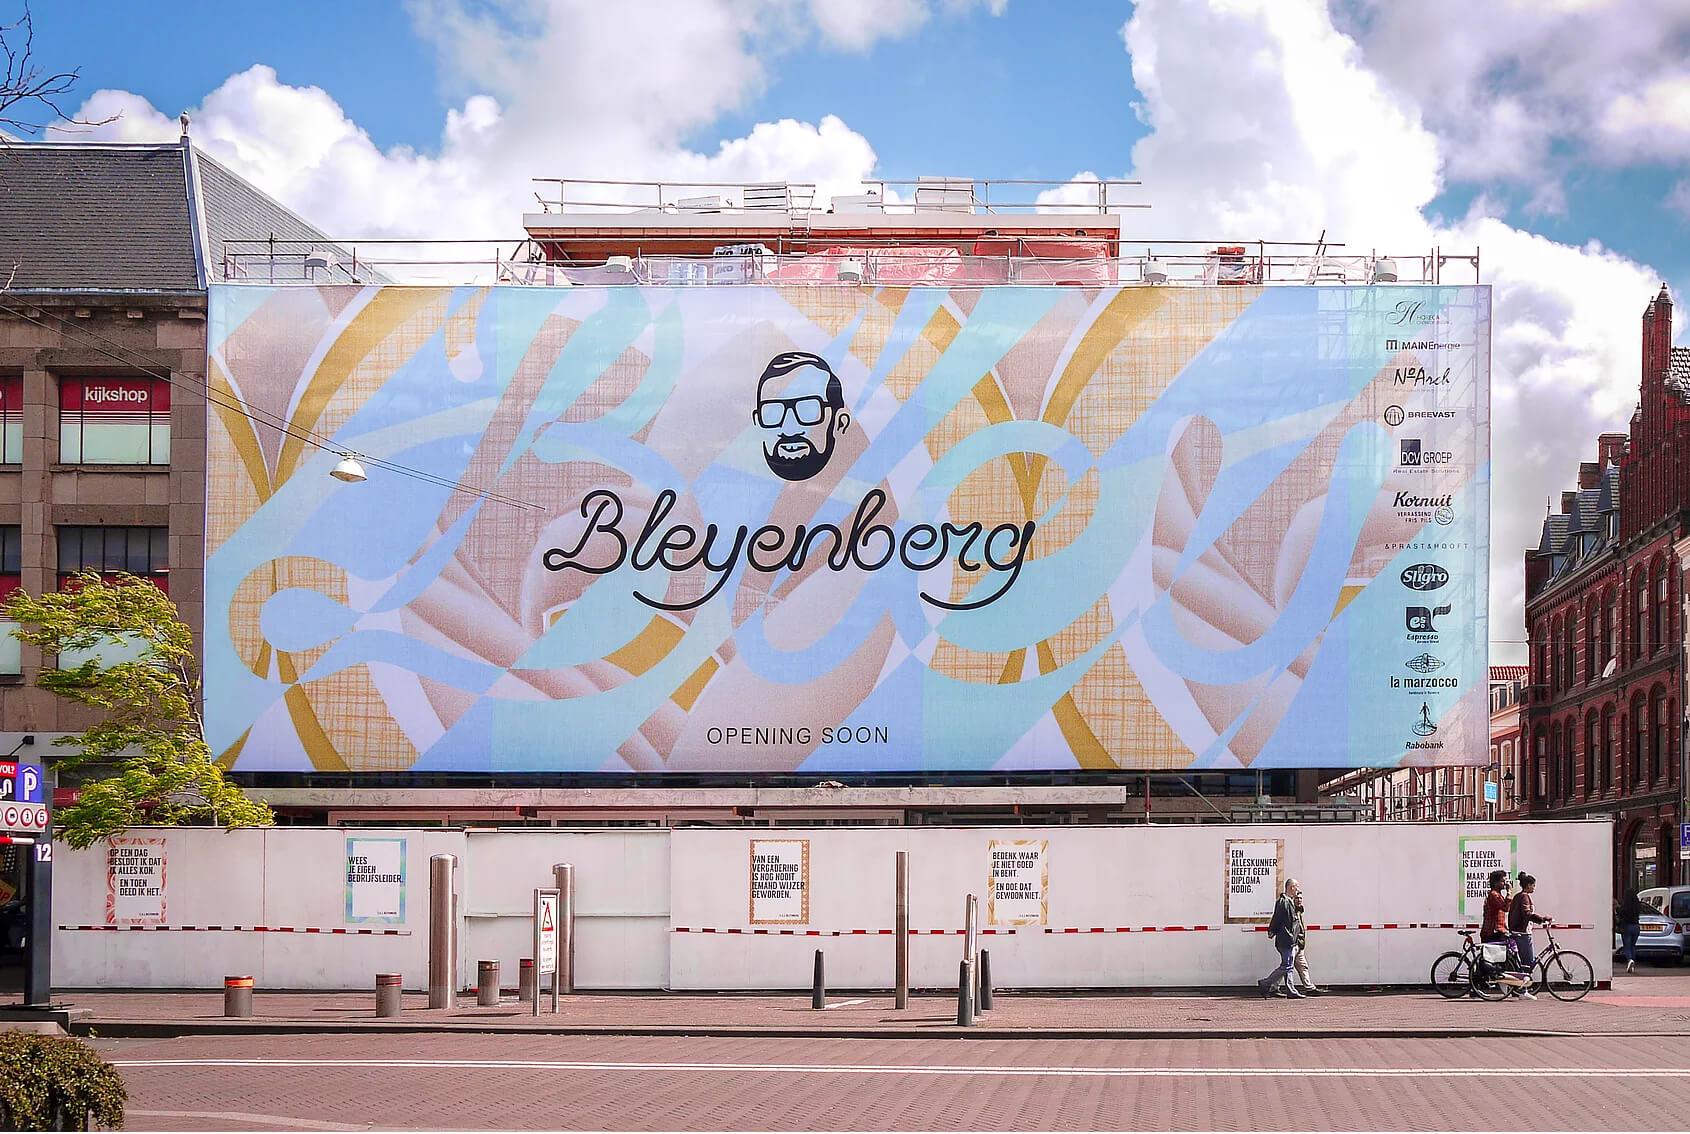 kapowski_bleyenberg_opening soon sing & posters